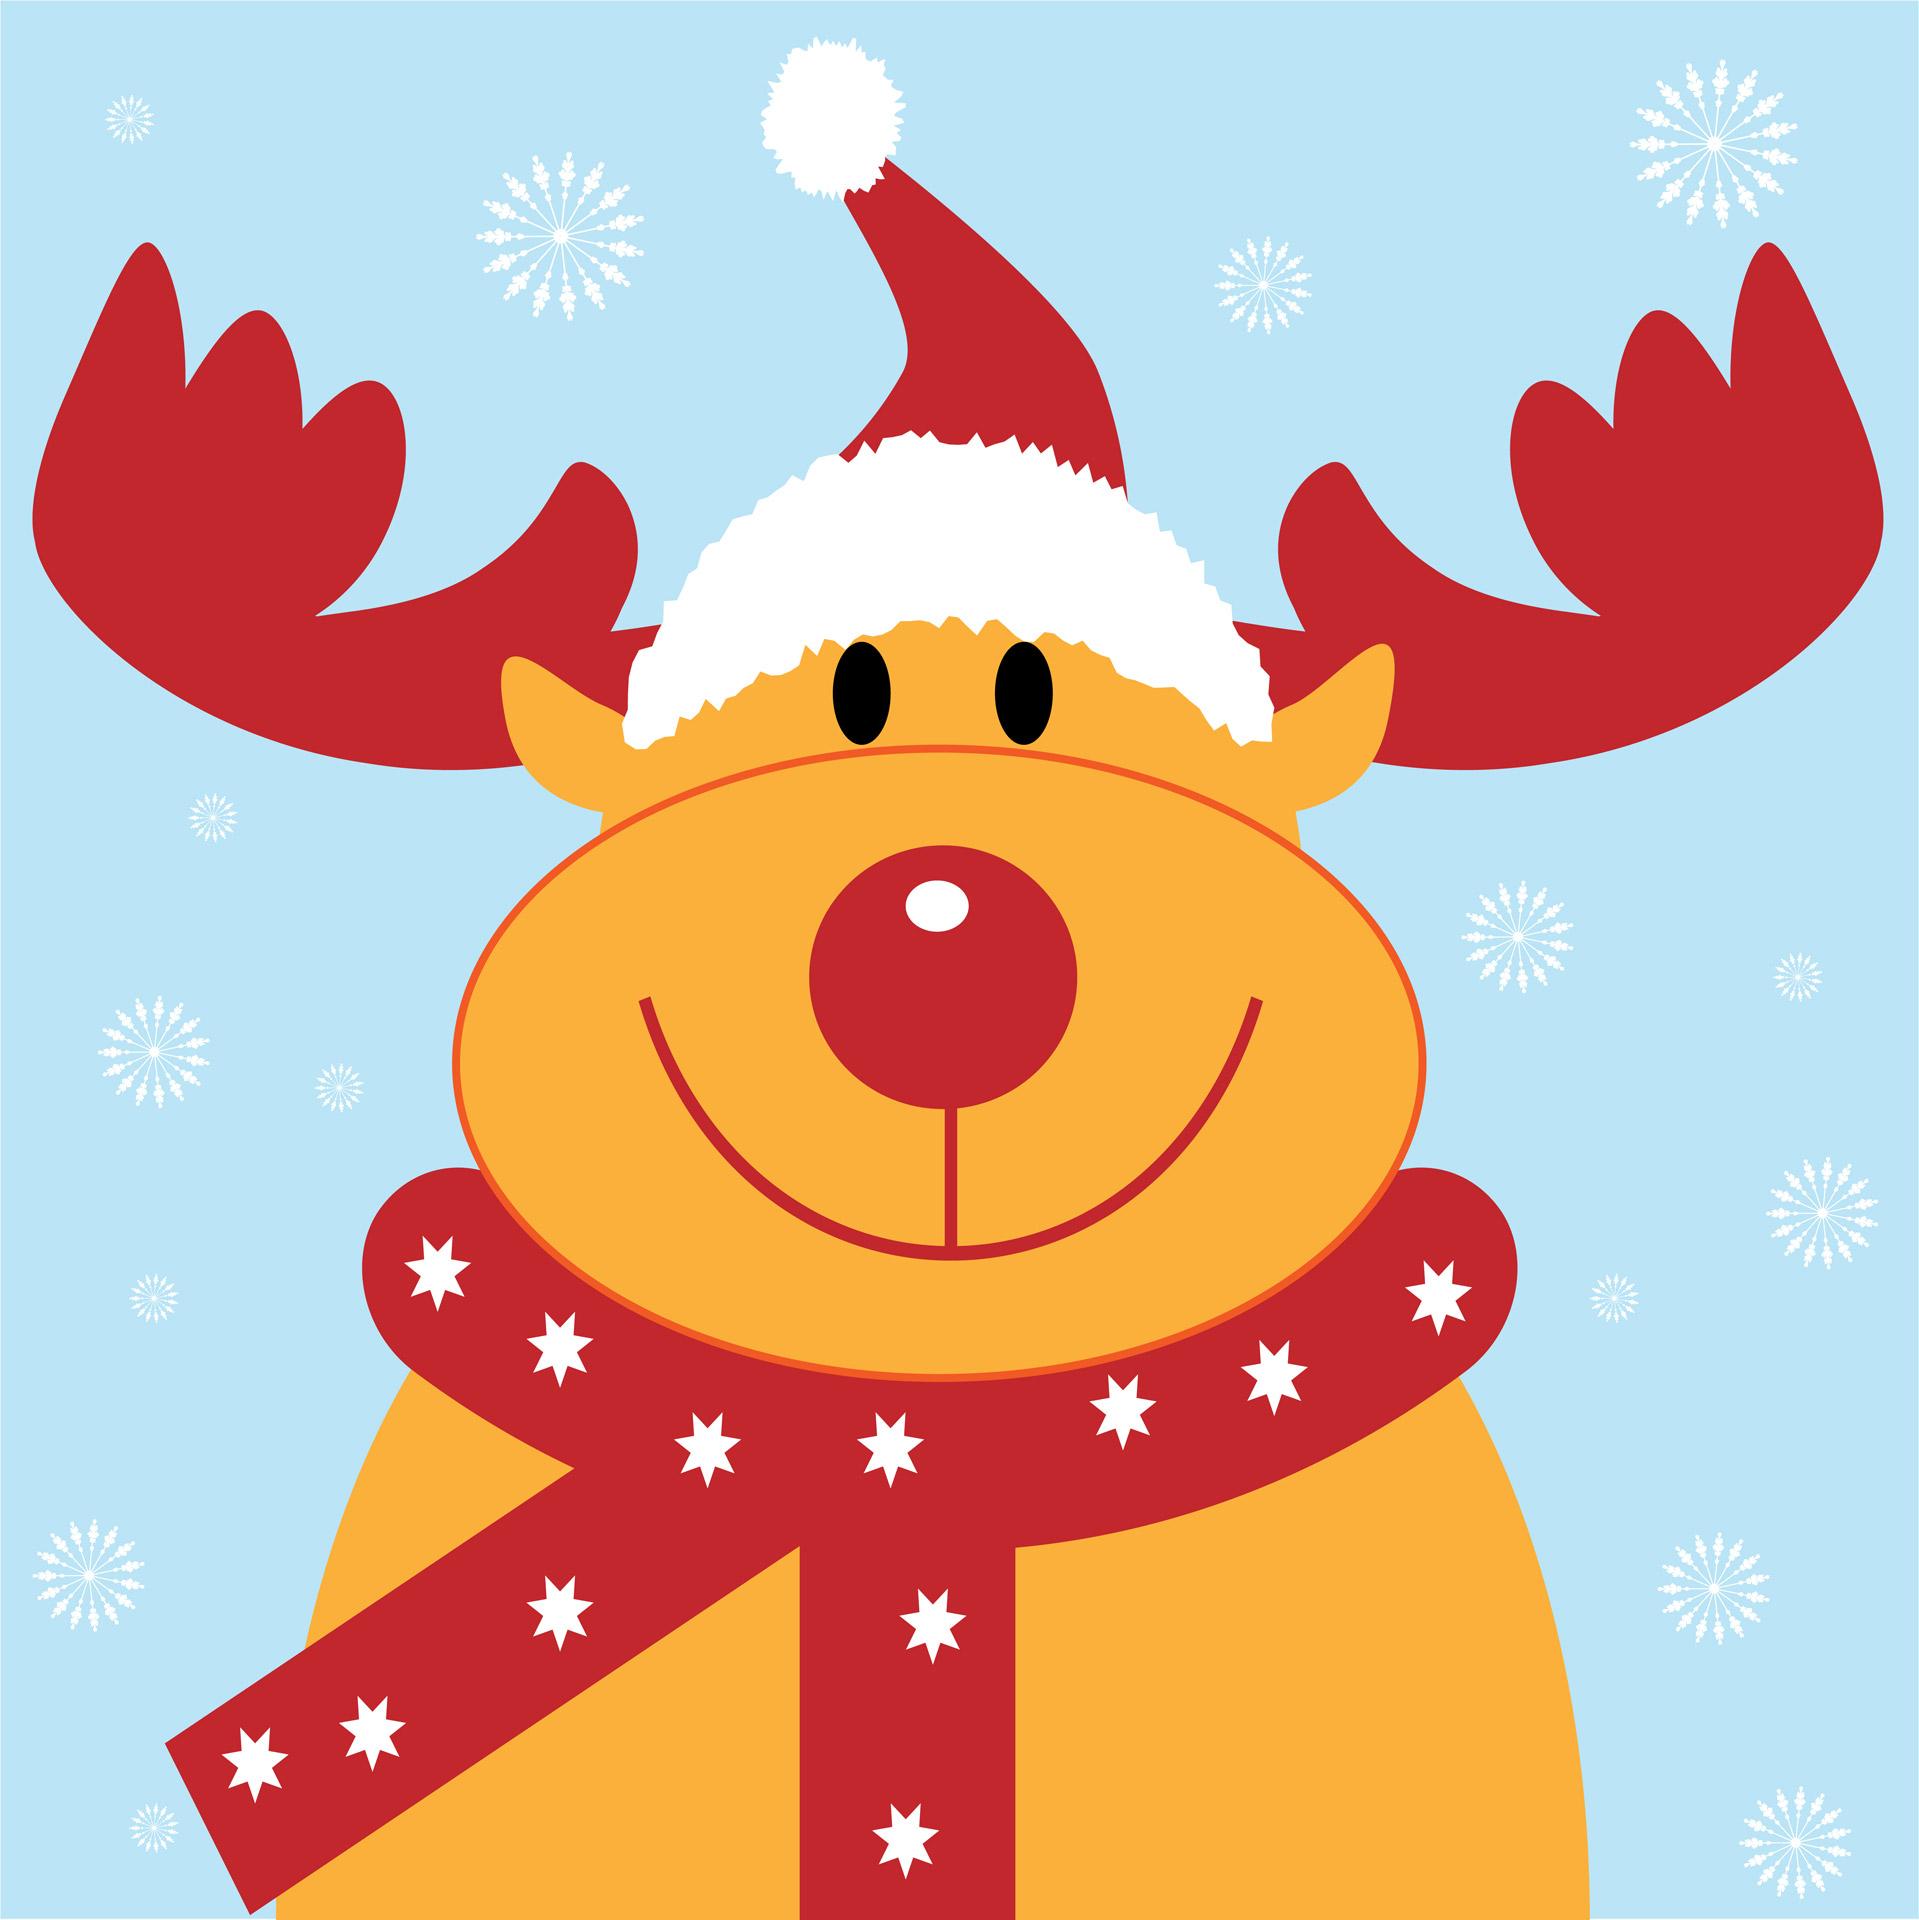 christmas-reindeer-1372605198PiI.jpg